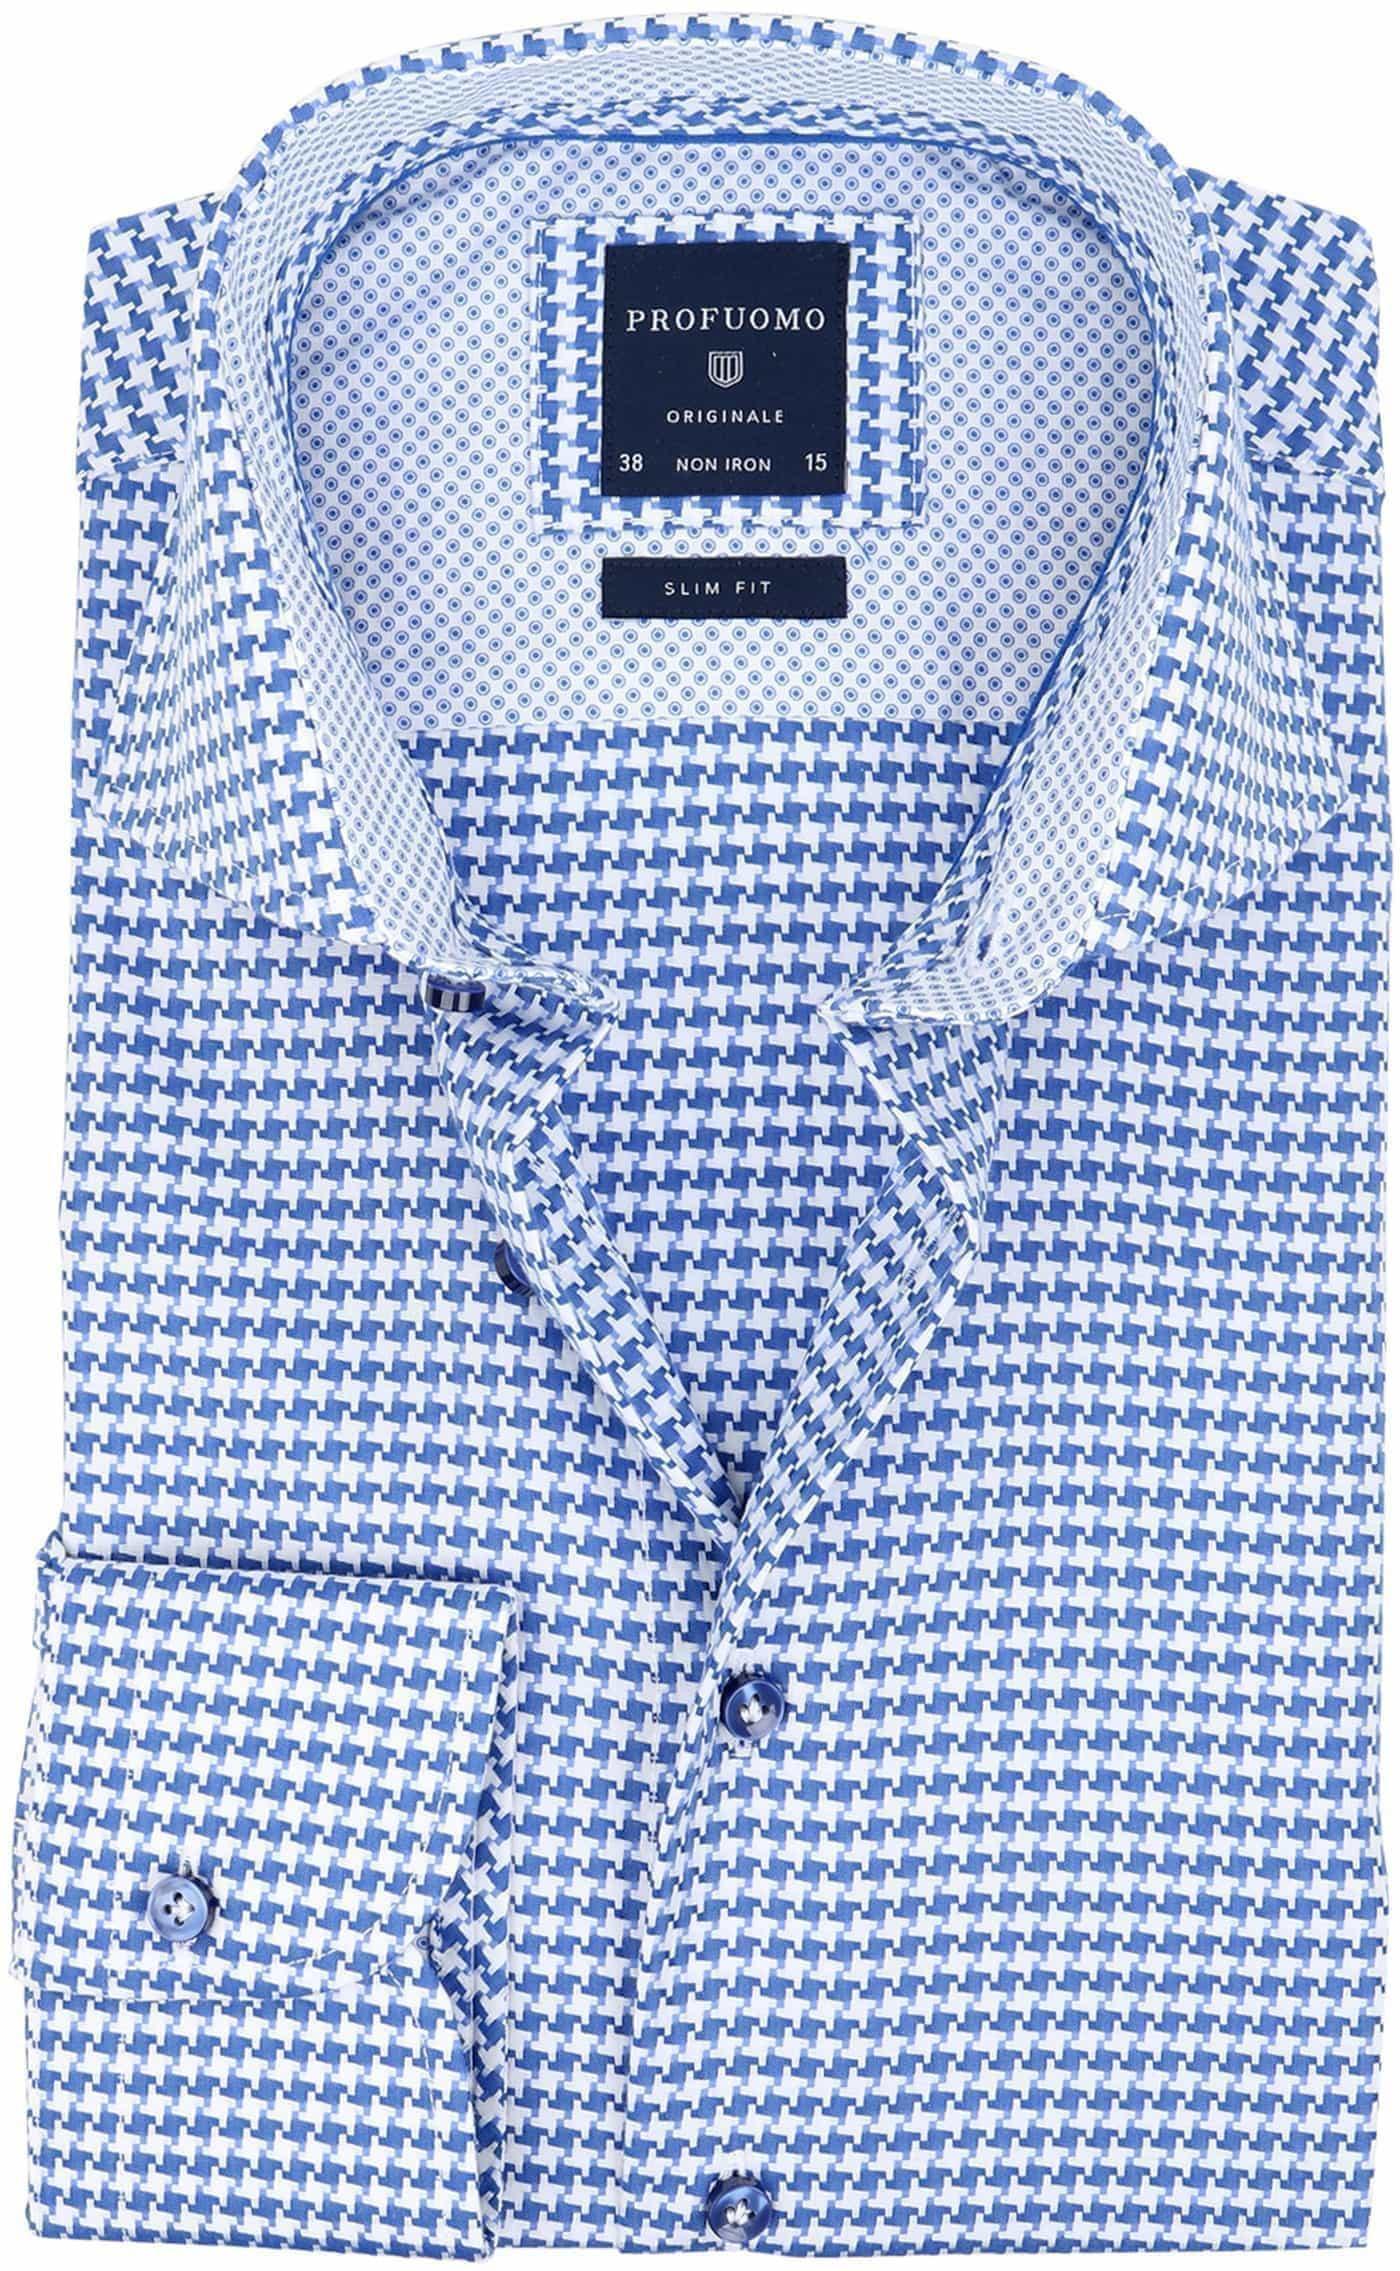 Profuomo Slim Fit Overhemd Blauw Wit foto 0